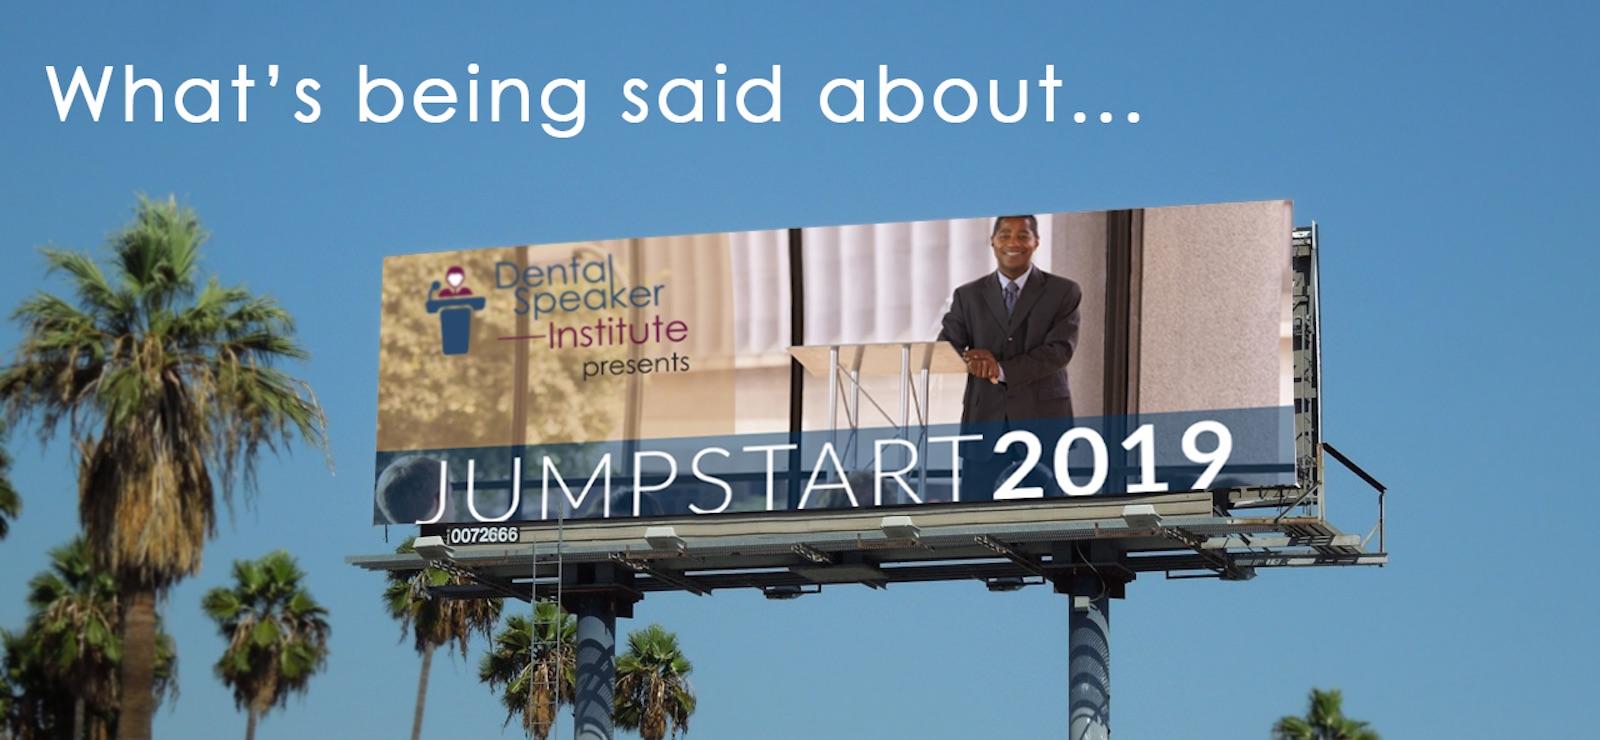 Reviews on Jumpstart Dental Conference